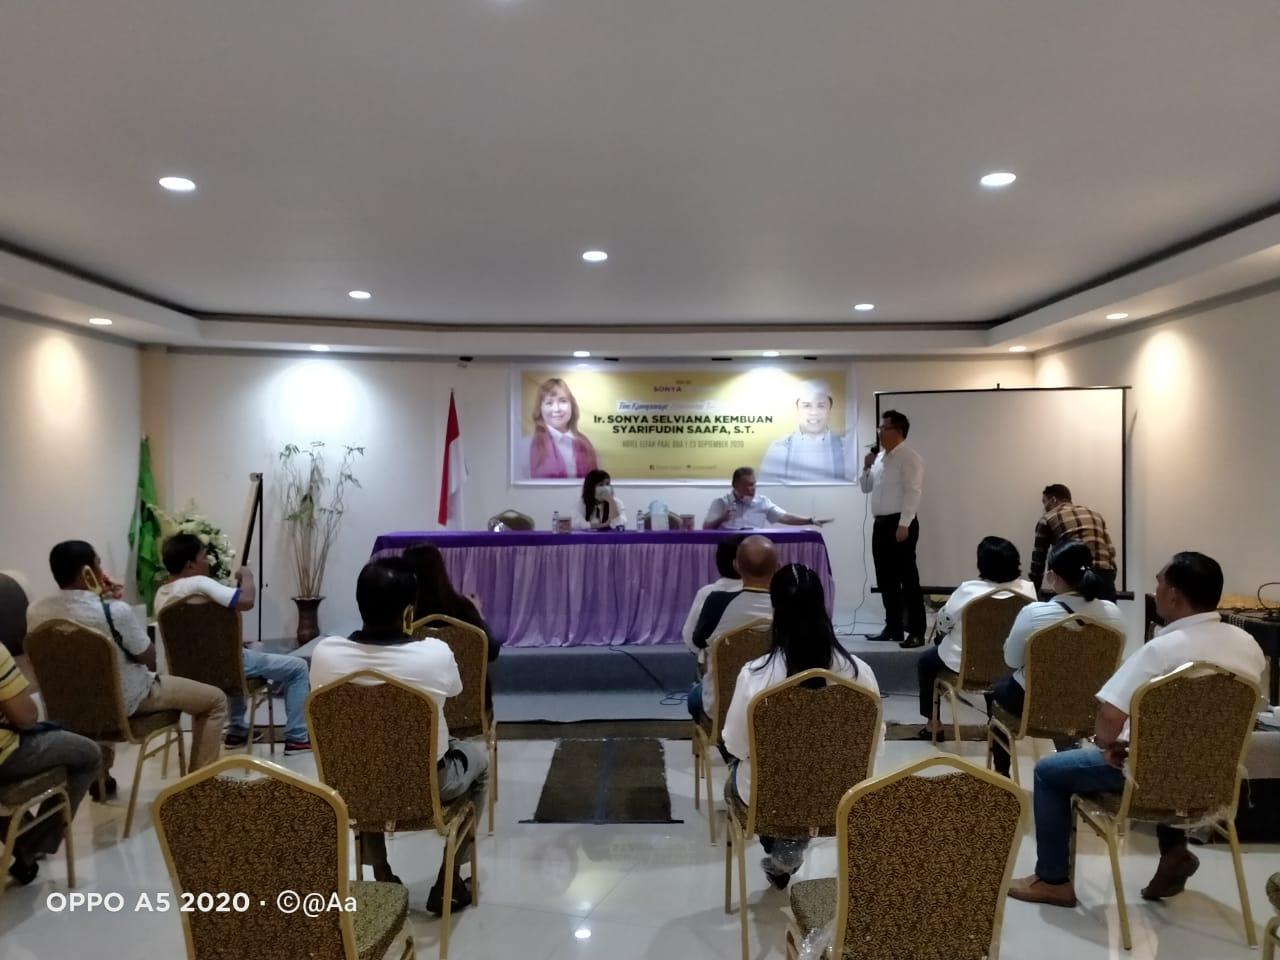 Ormas MKGR Kota Manado Siap Menangkan Sonya Kembuan-Syarifudin Saafa